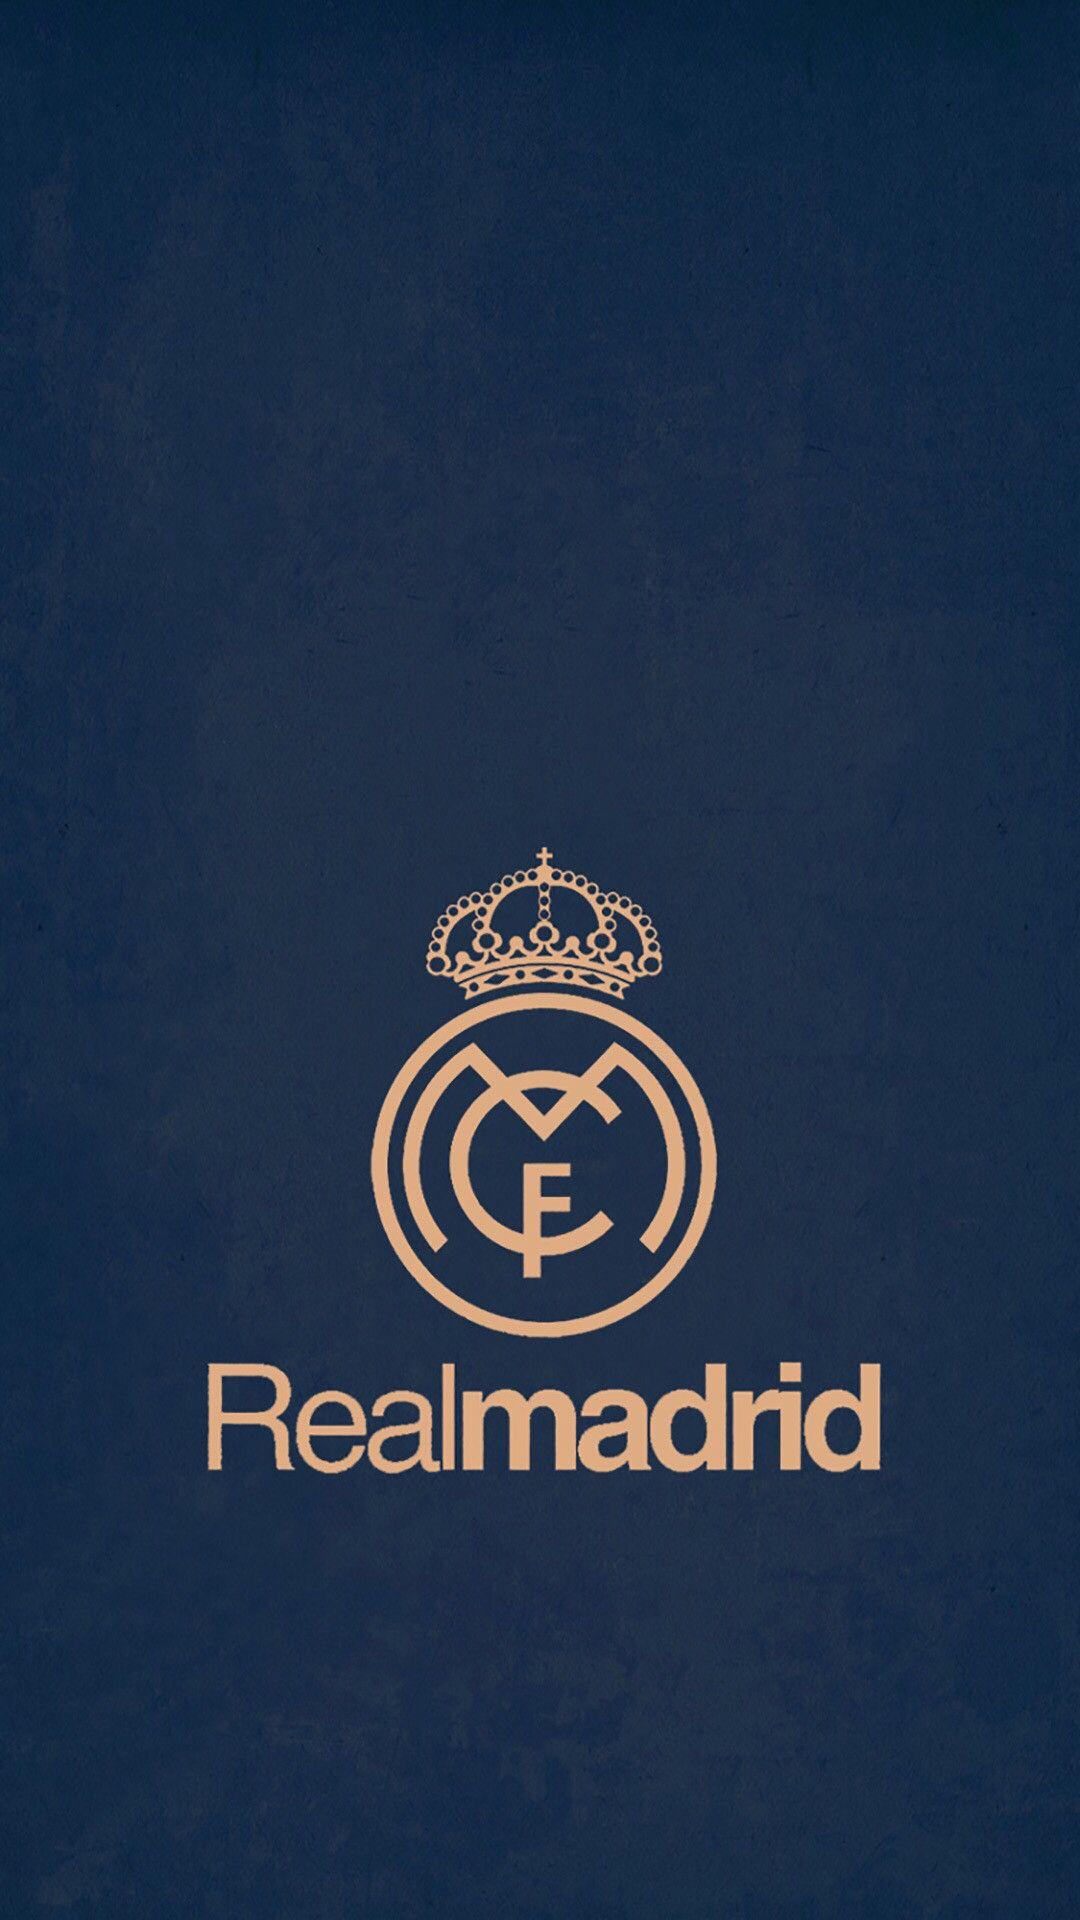 Real Madrid Wallpaper For Phone Hd Football Real Madrid Wallpapers Madrid Wallpaper Real Madrid Football